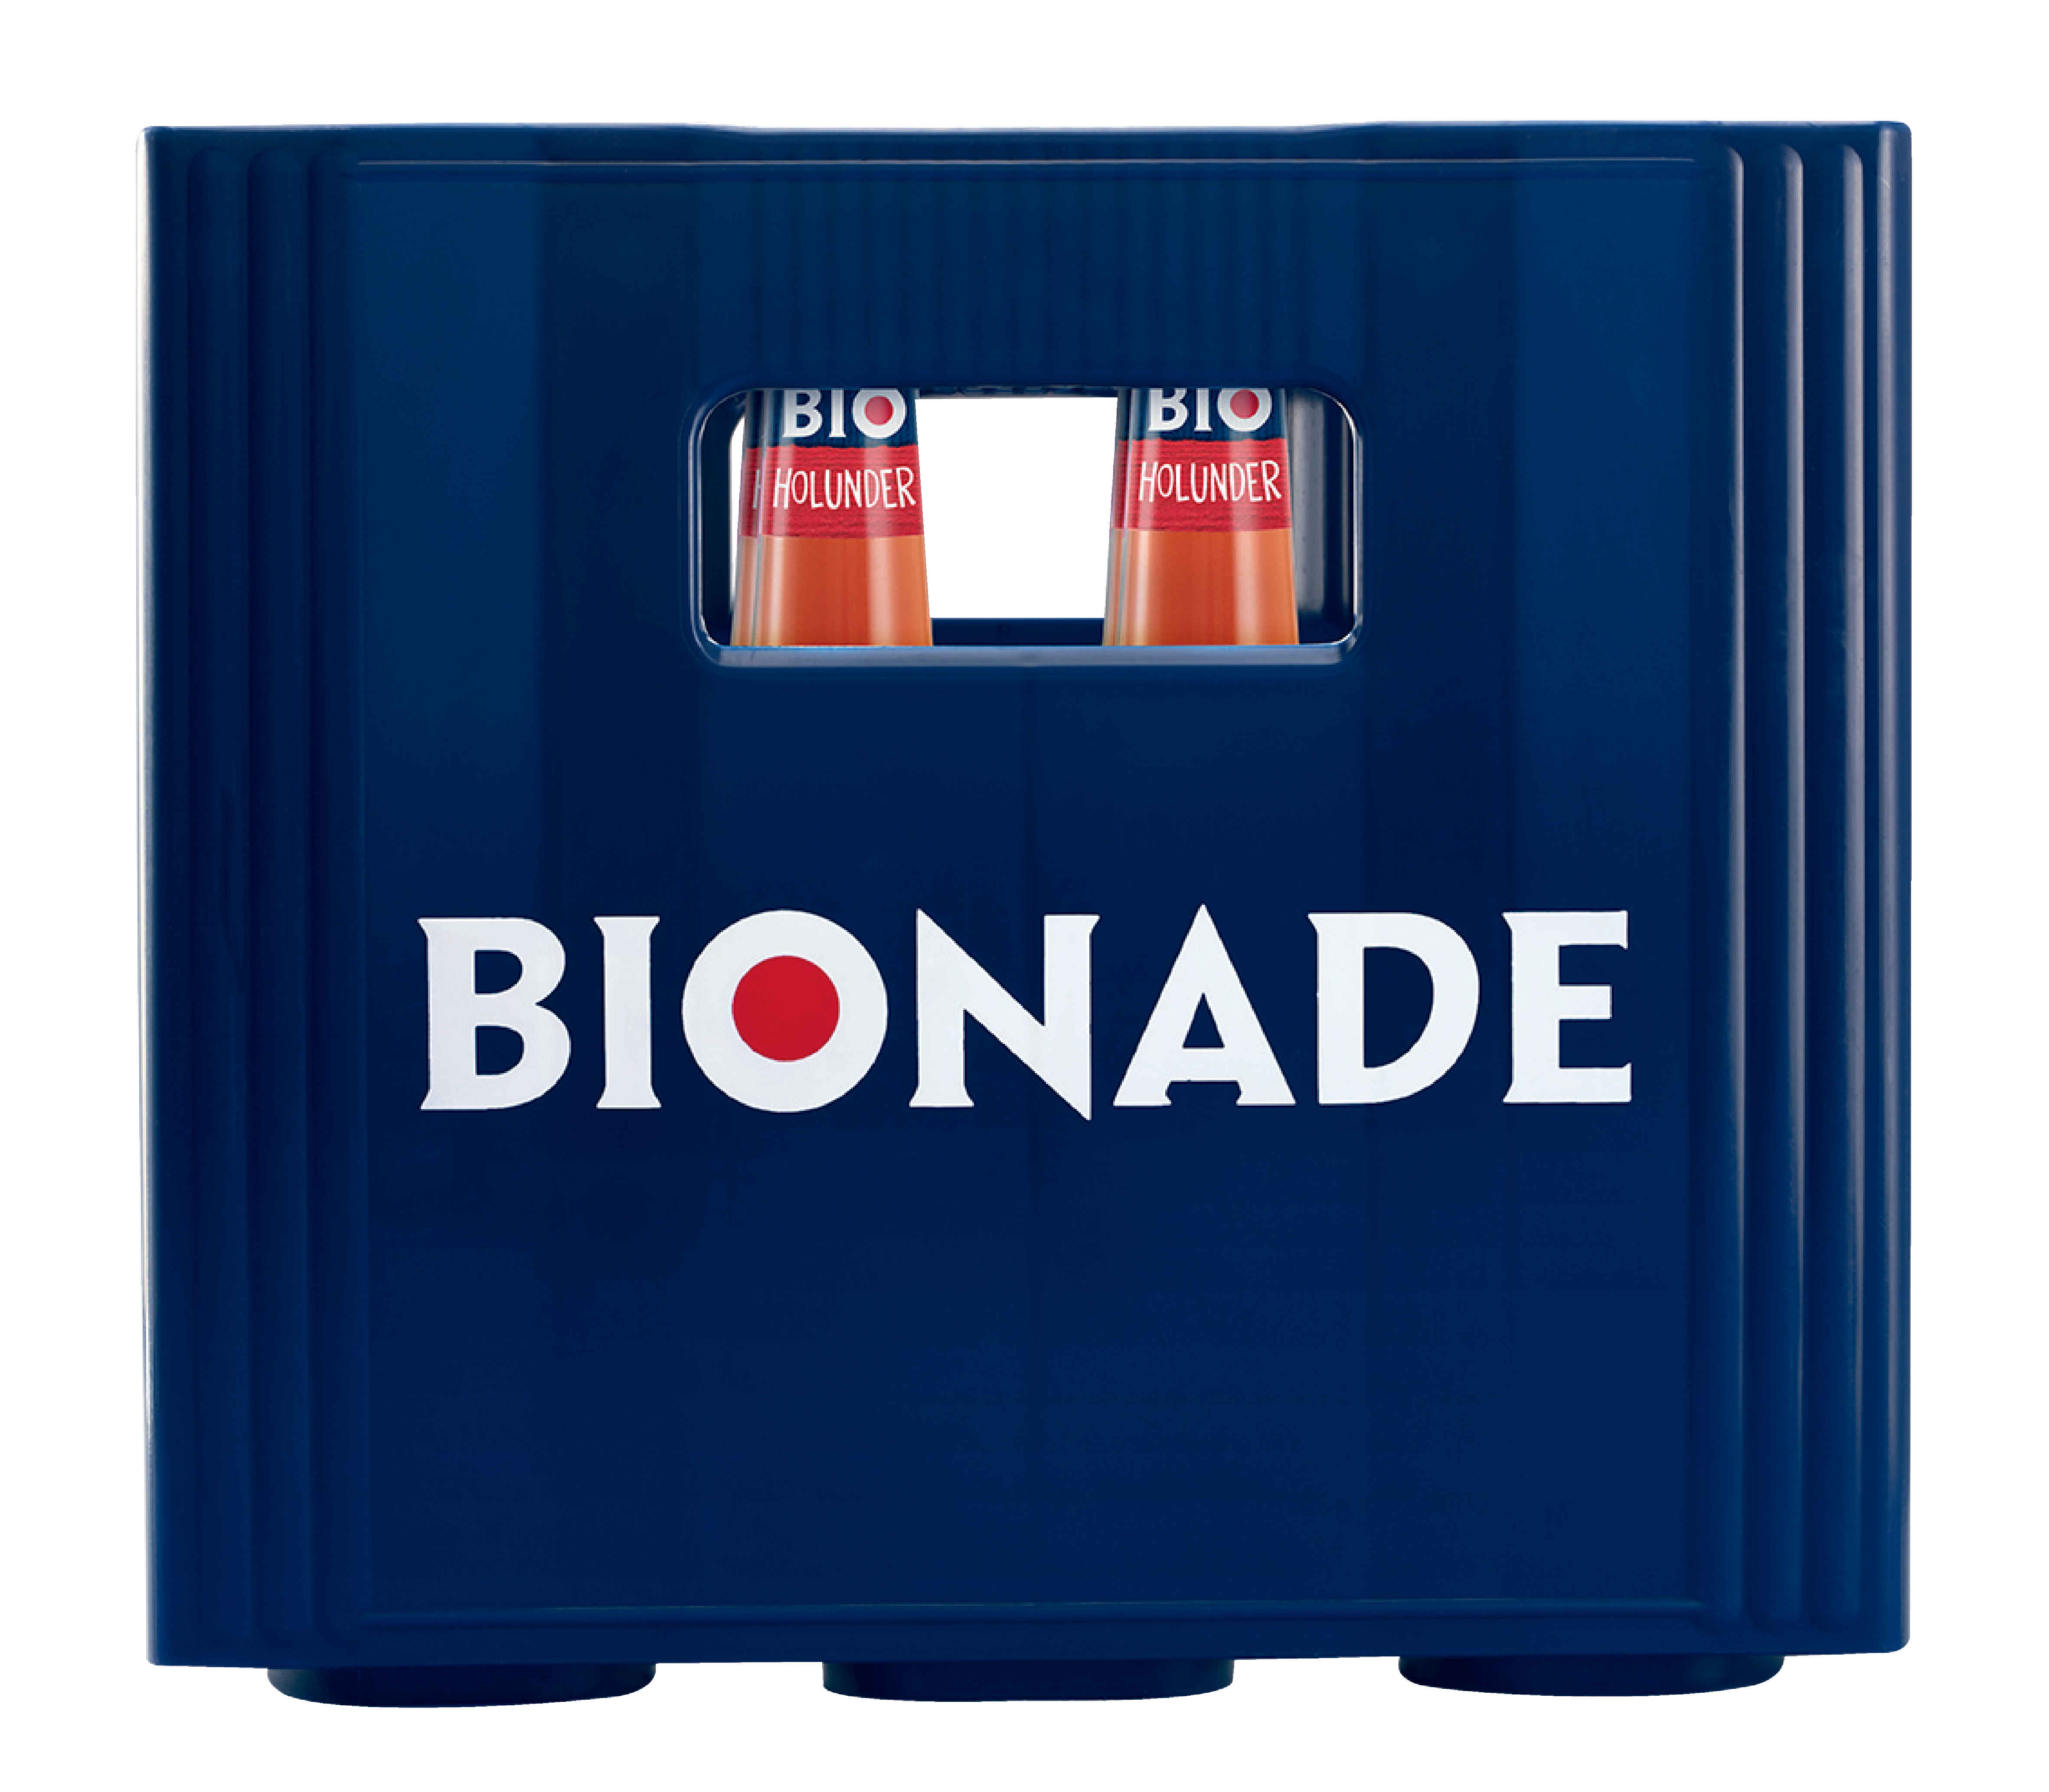 Bionade Holunder 12x0,33l Mehrweg Glas